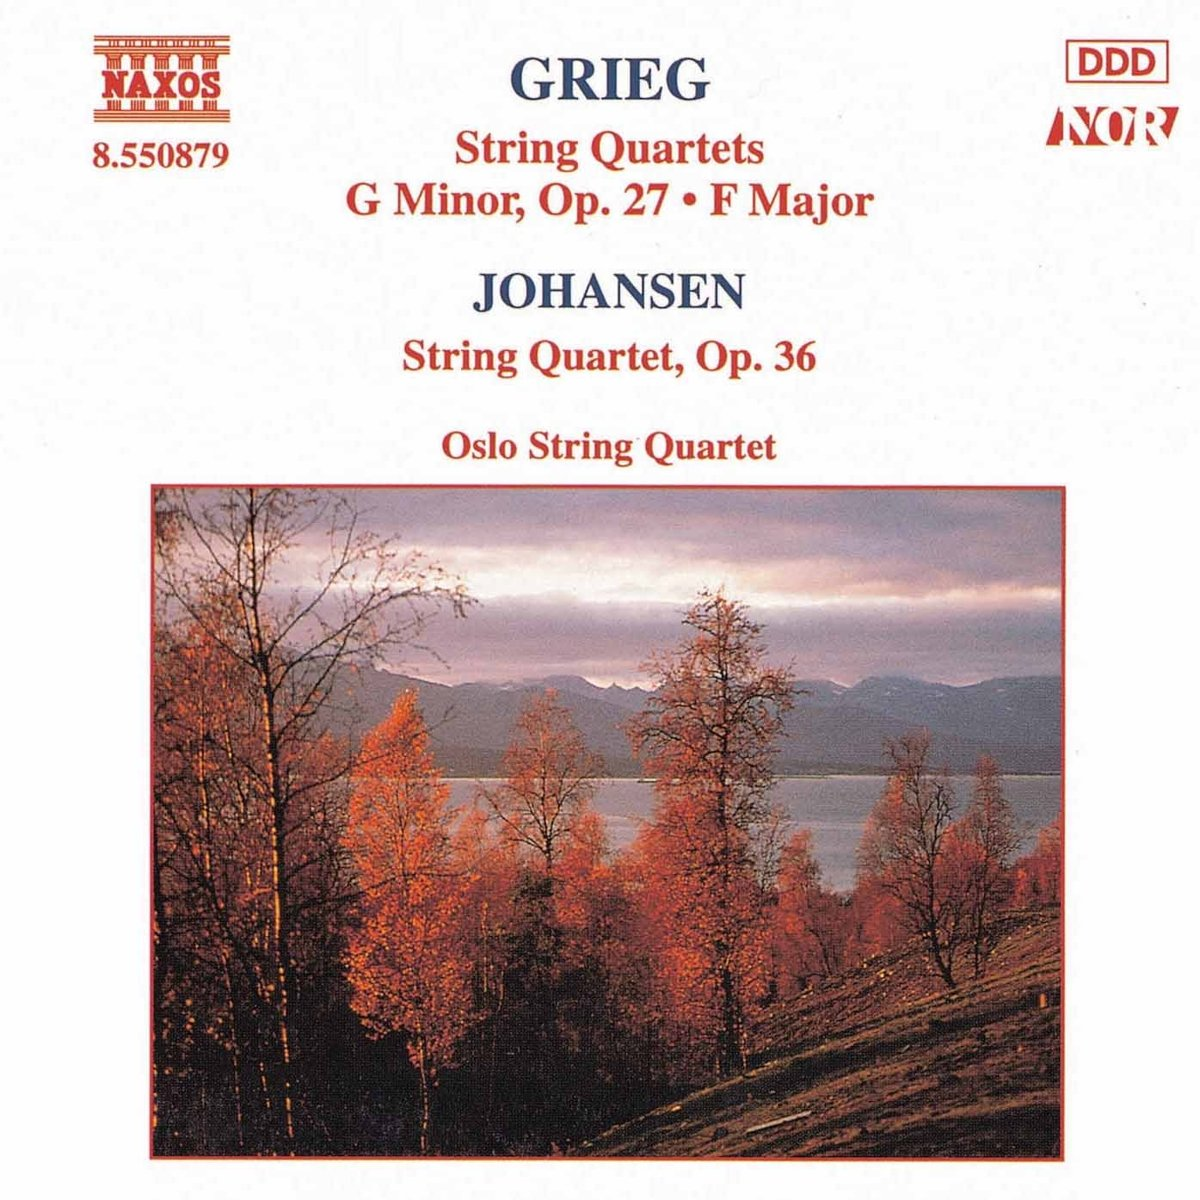 Grieg, Monrad Johansen: String quartets - The very first Oslo String Quartet albumRecorded in Main Studio, NRK Oslo, October 1993Producer: Krzysztof DrabNAXOS 8.550879